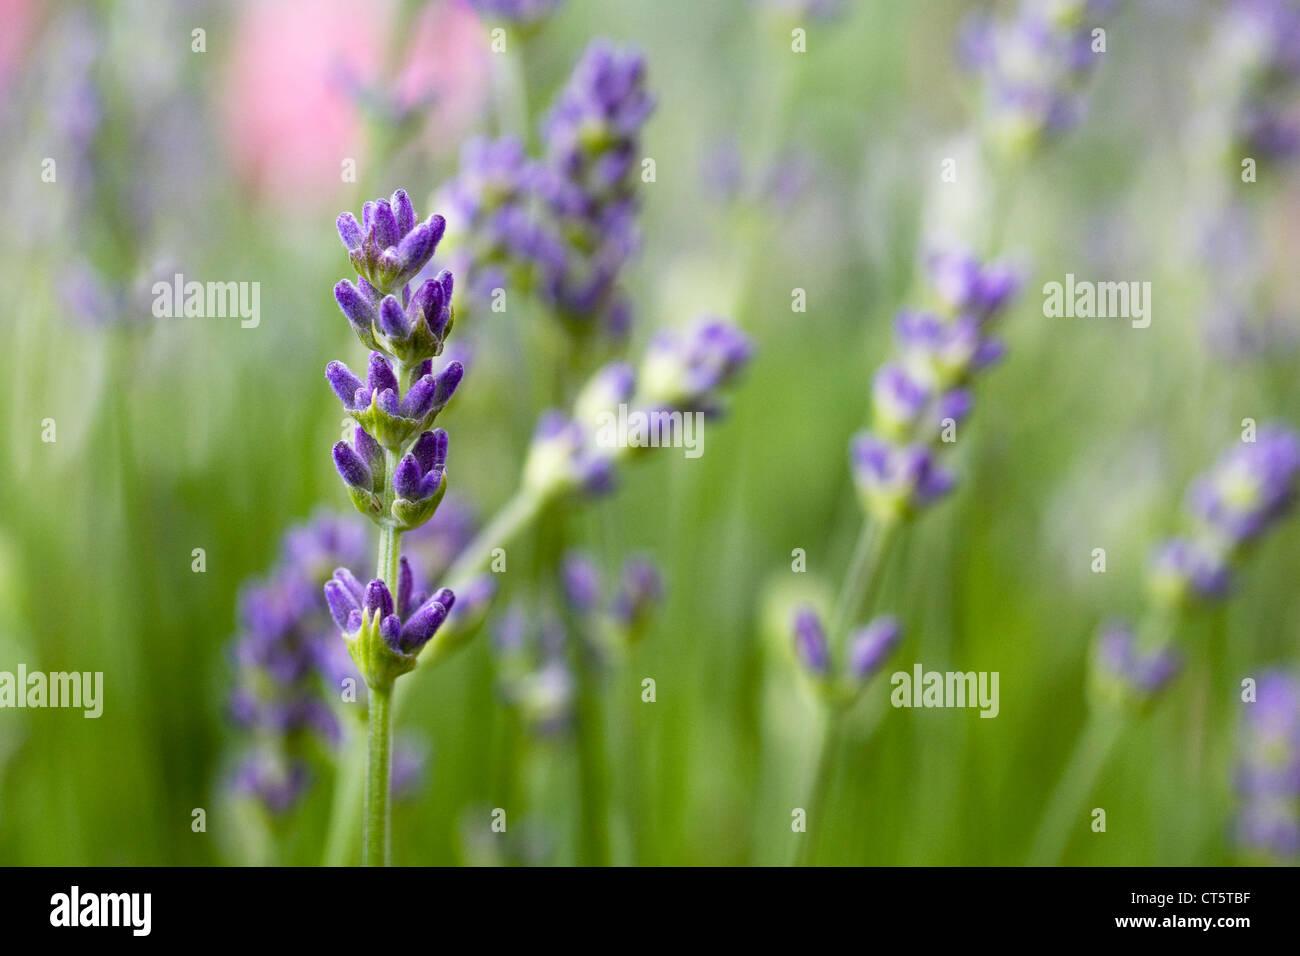 Lavender in an English garden. Lavandula flowers. - Stock Image